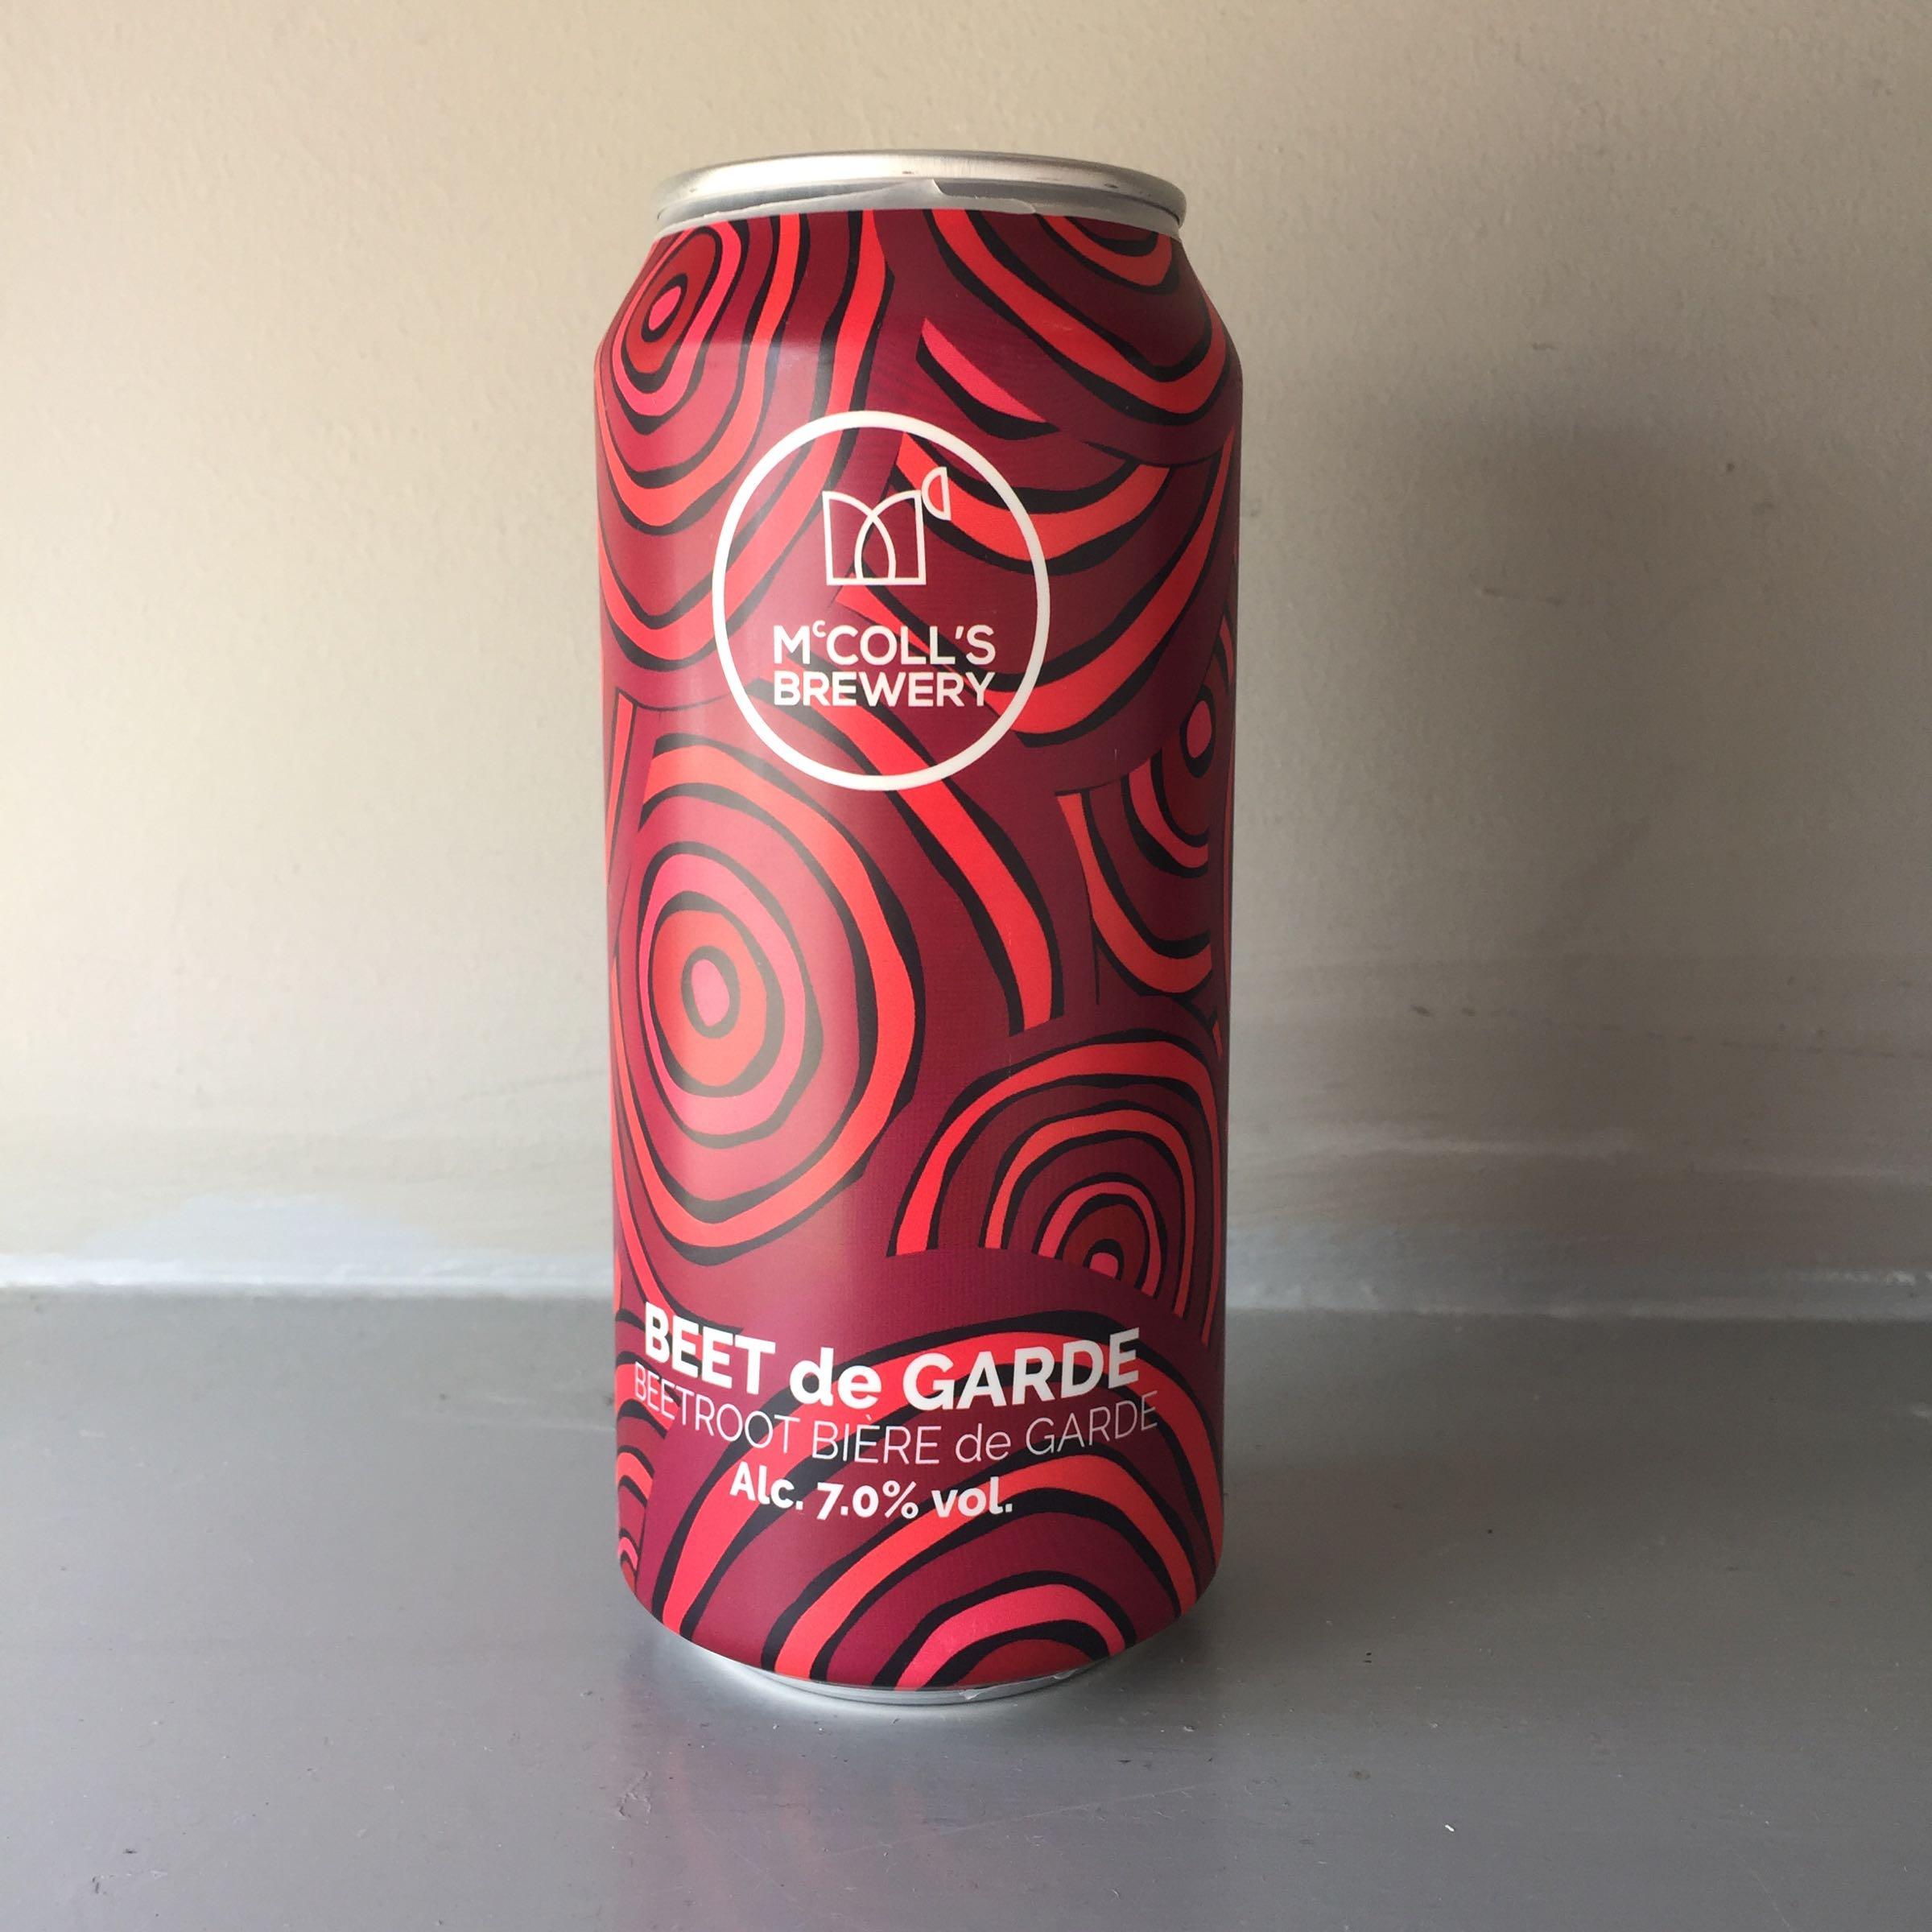 McColls Brewery 'Beet de Garde' Beetroot Bière de Garde 440ml 7.0% ABV